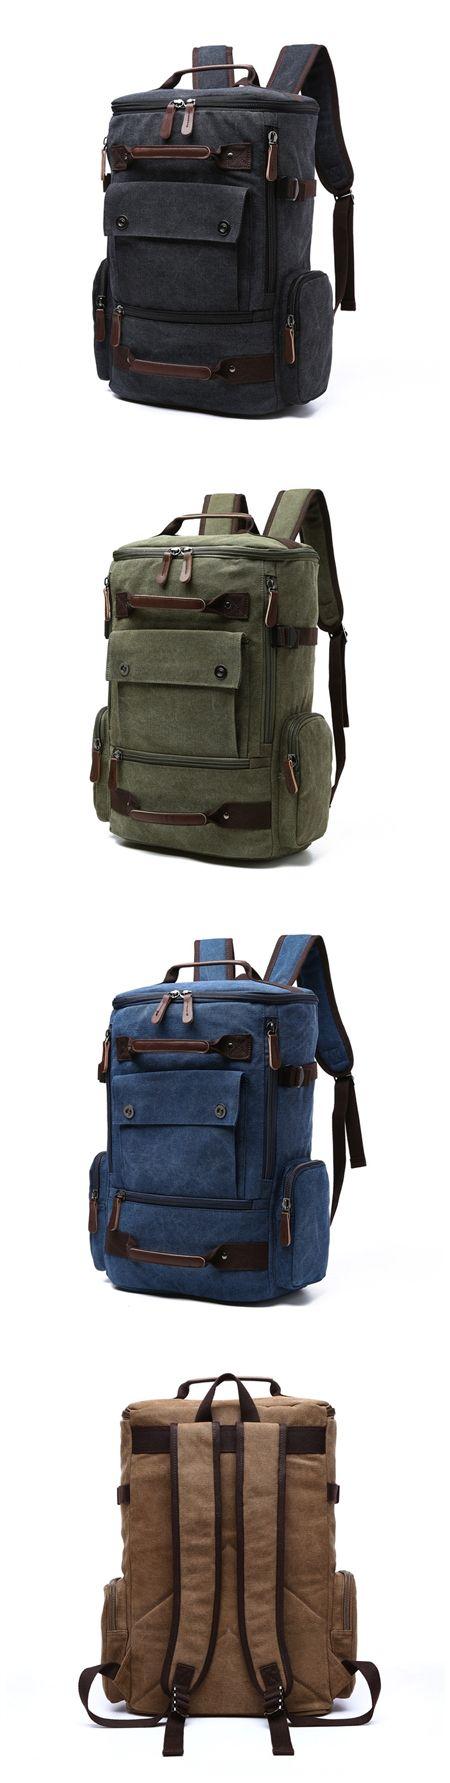 Unisex Canvas Backpack Shoulder Bag Large-capacity Leisure Multi-purpose Travel Shoulder Bag Bagail.com